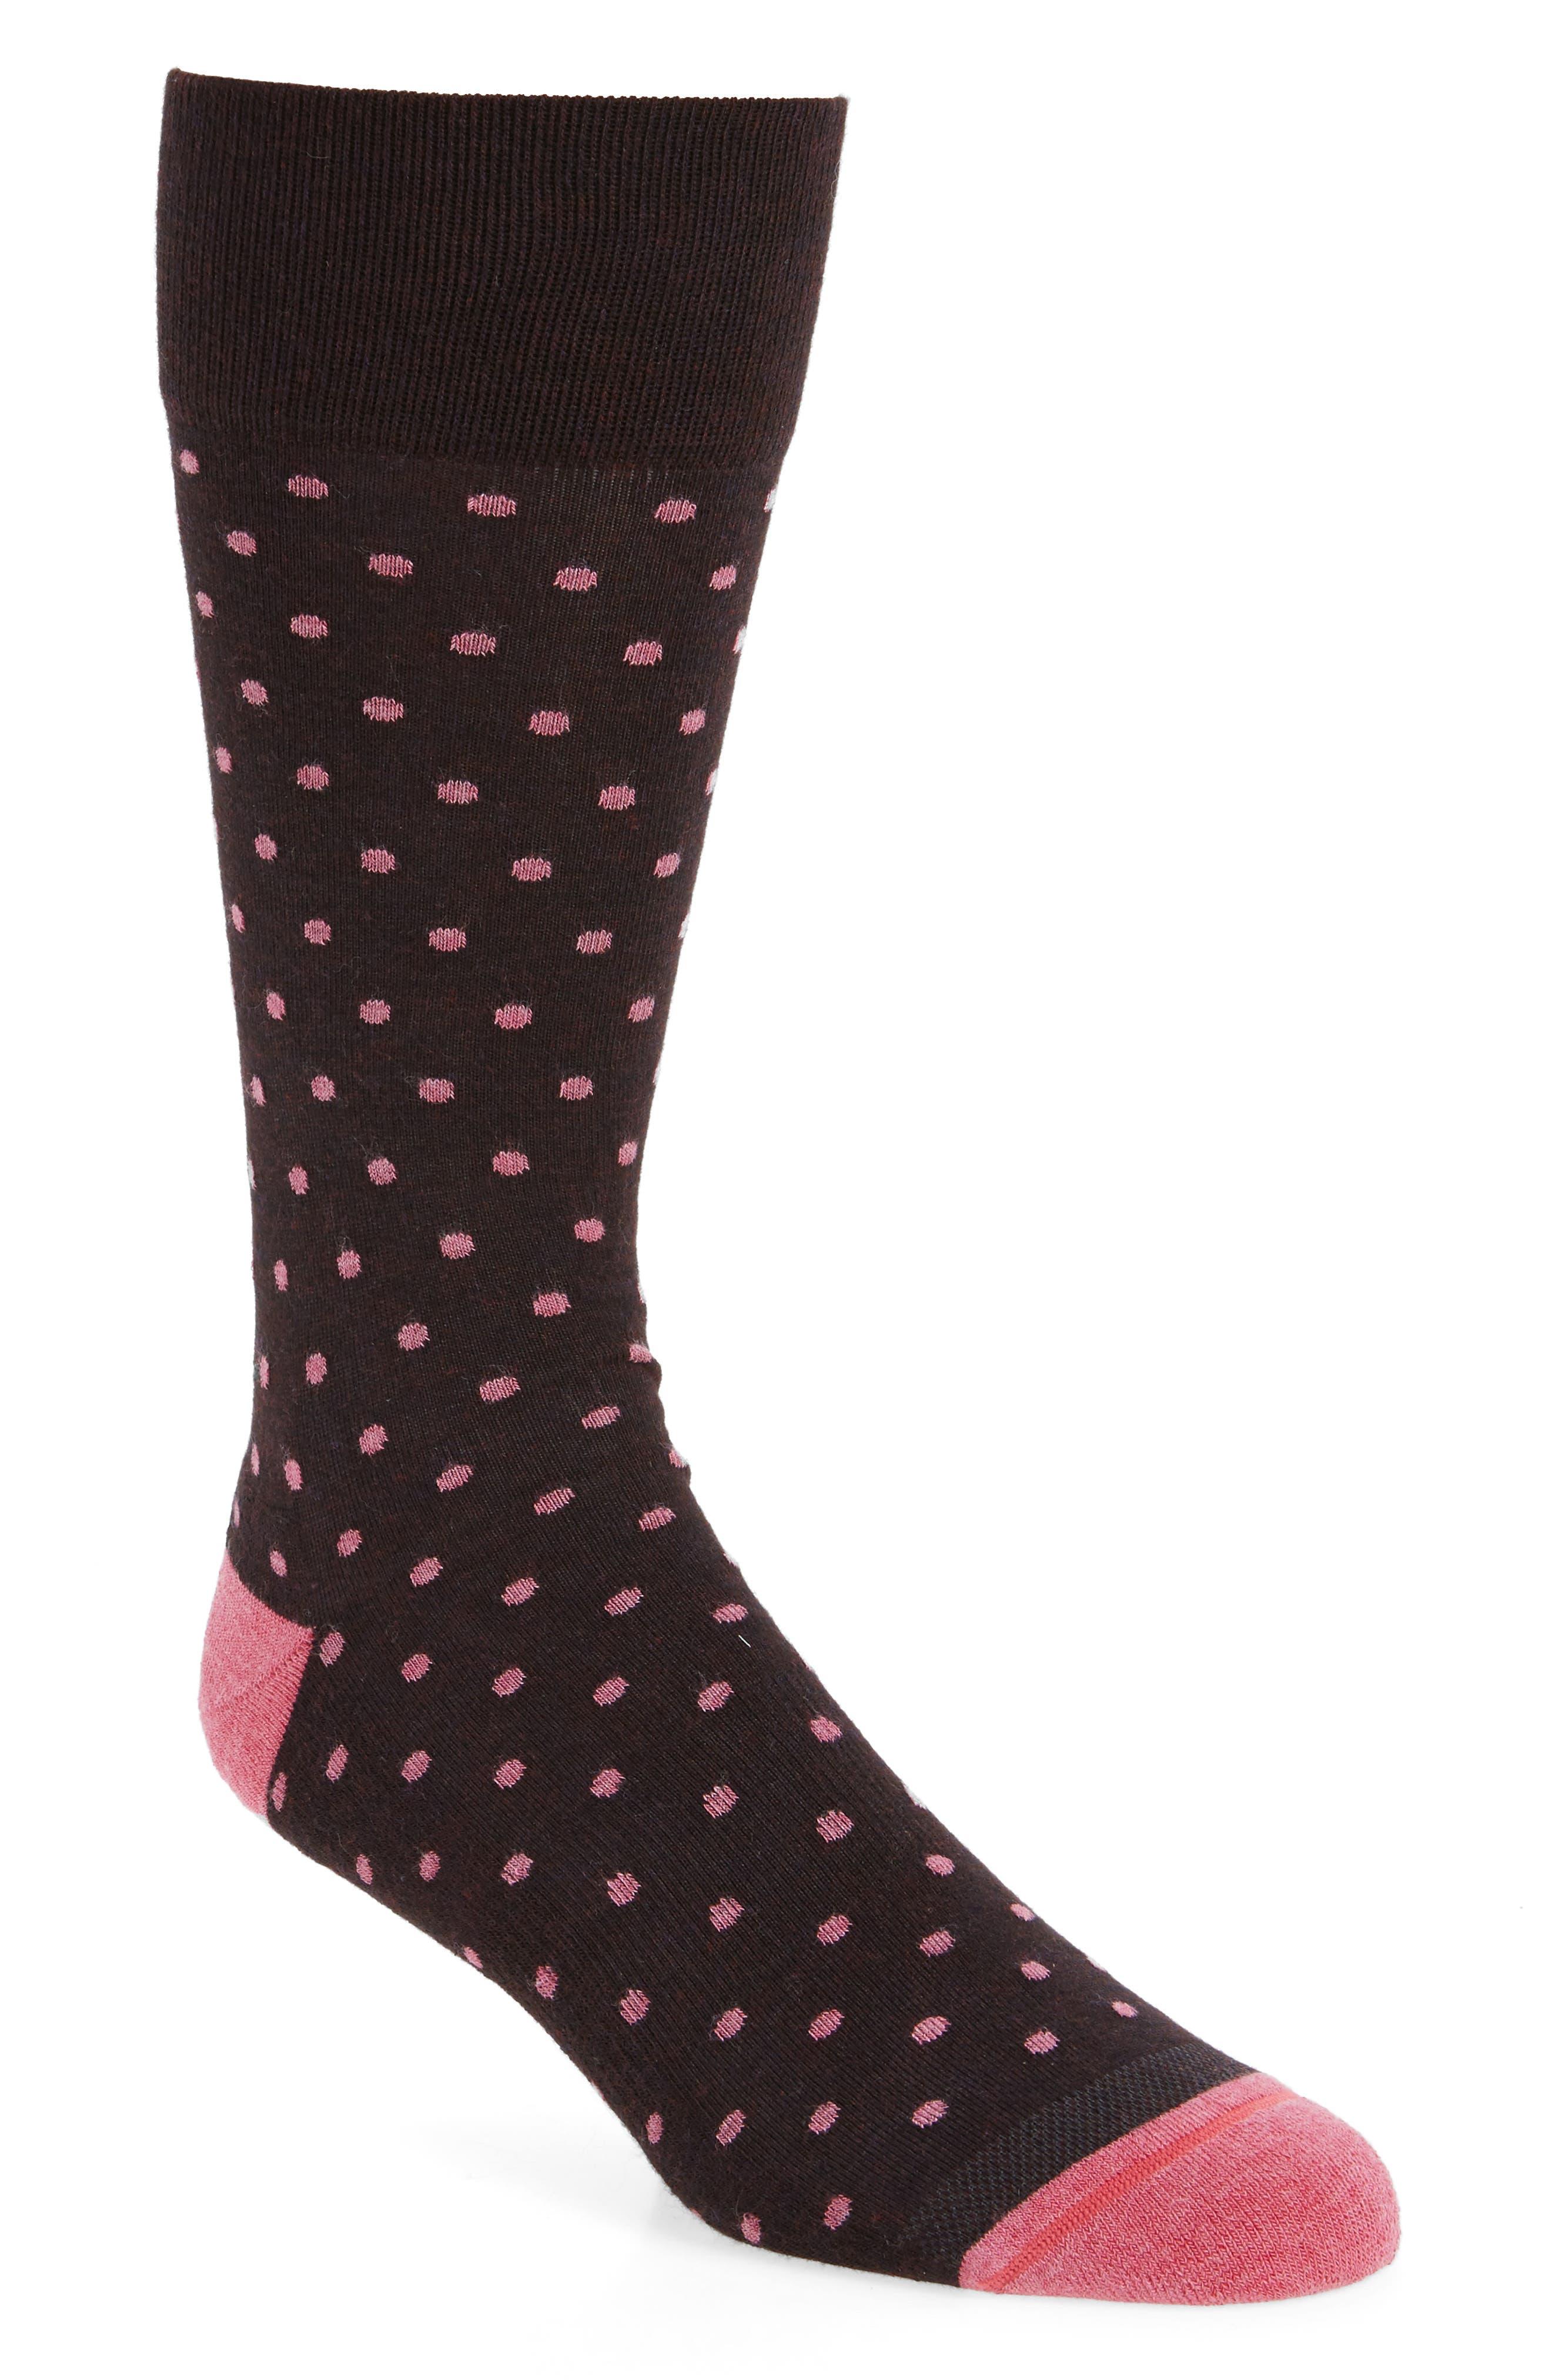 Dot Socks,                             Main thumbnail 1, color,                             Brown Heather